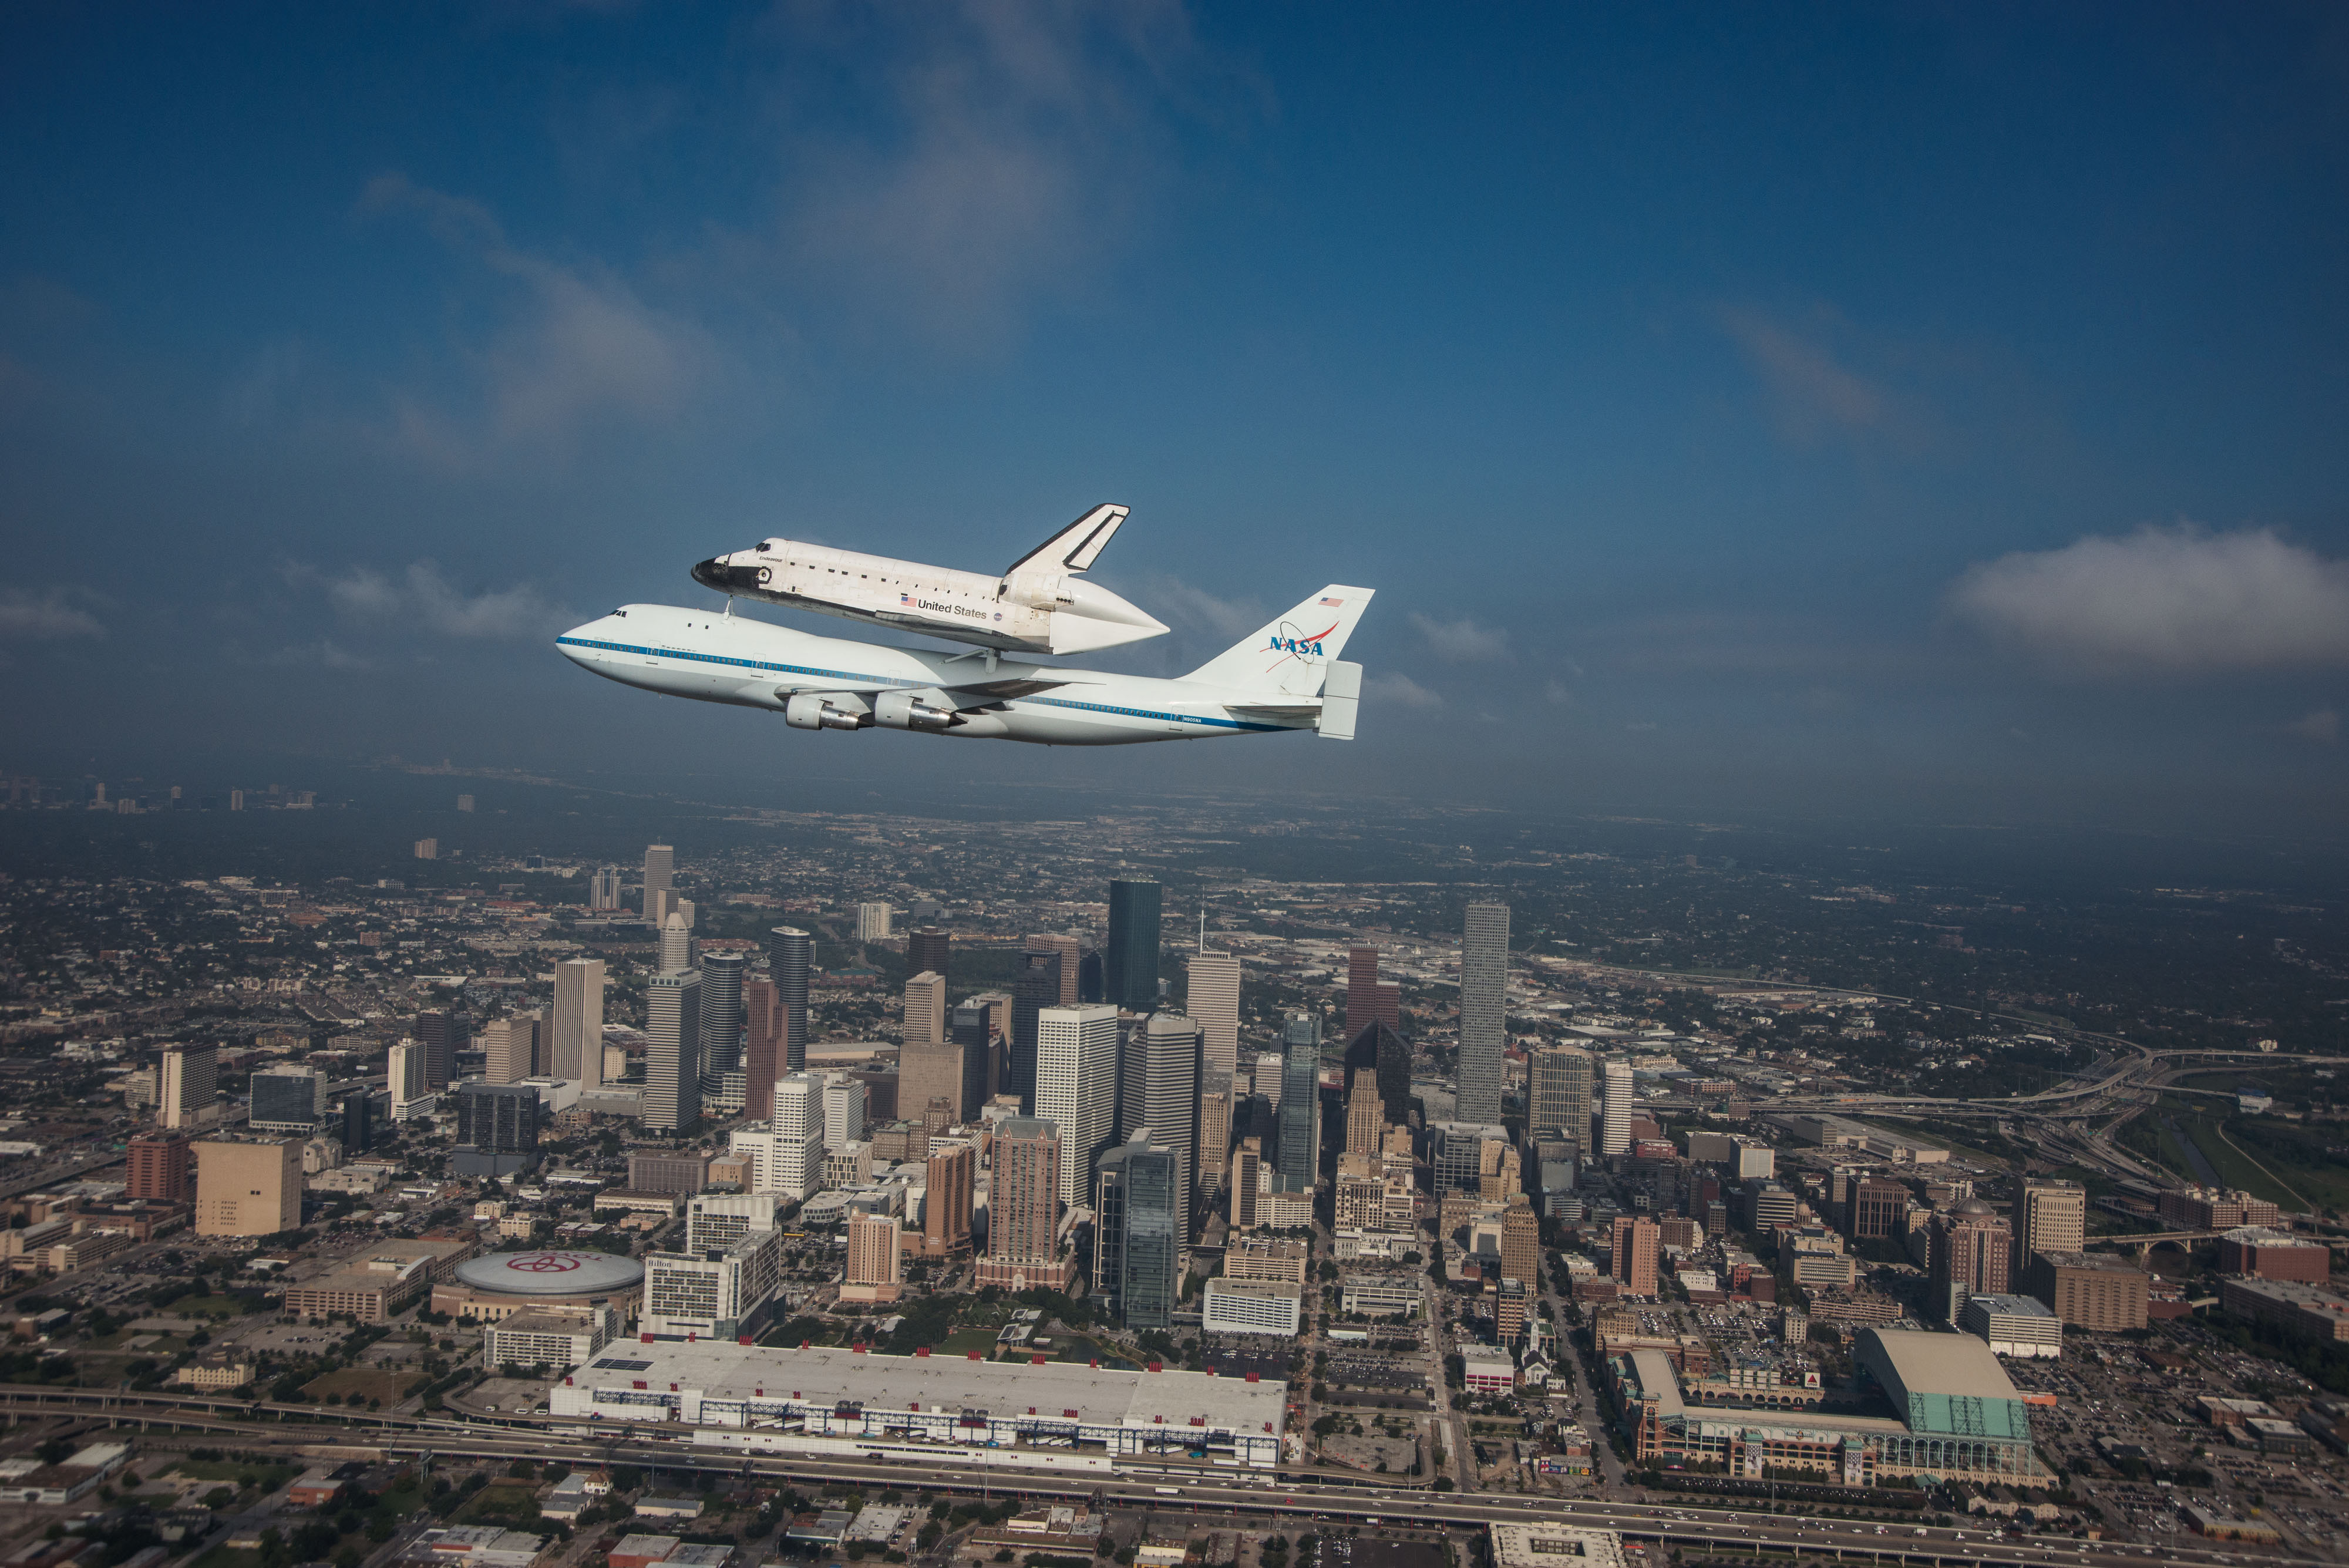 space shuttle landing in houston - photo #2